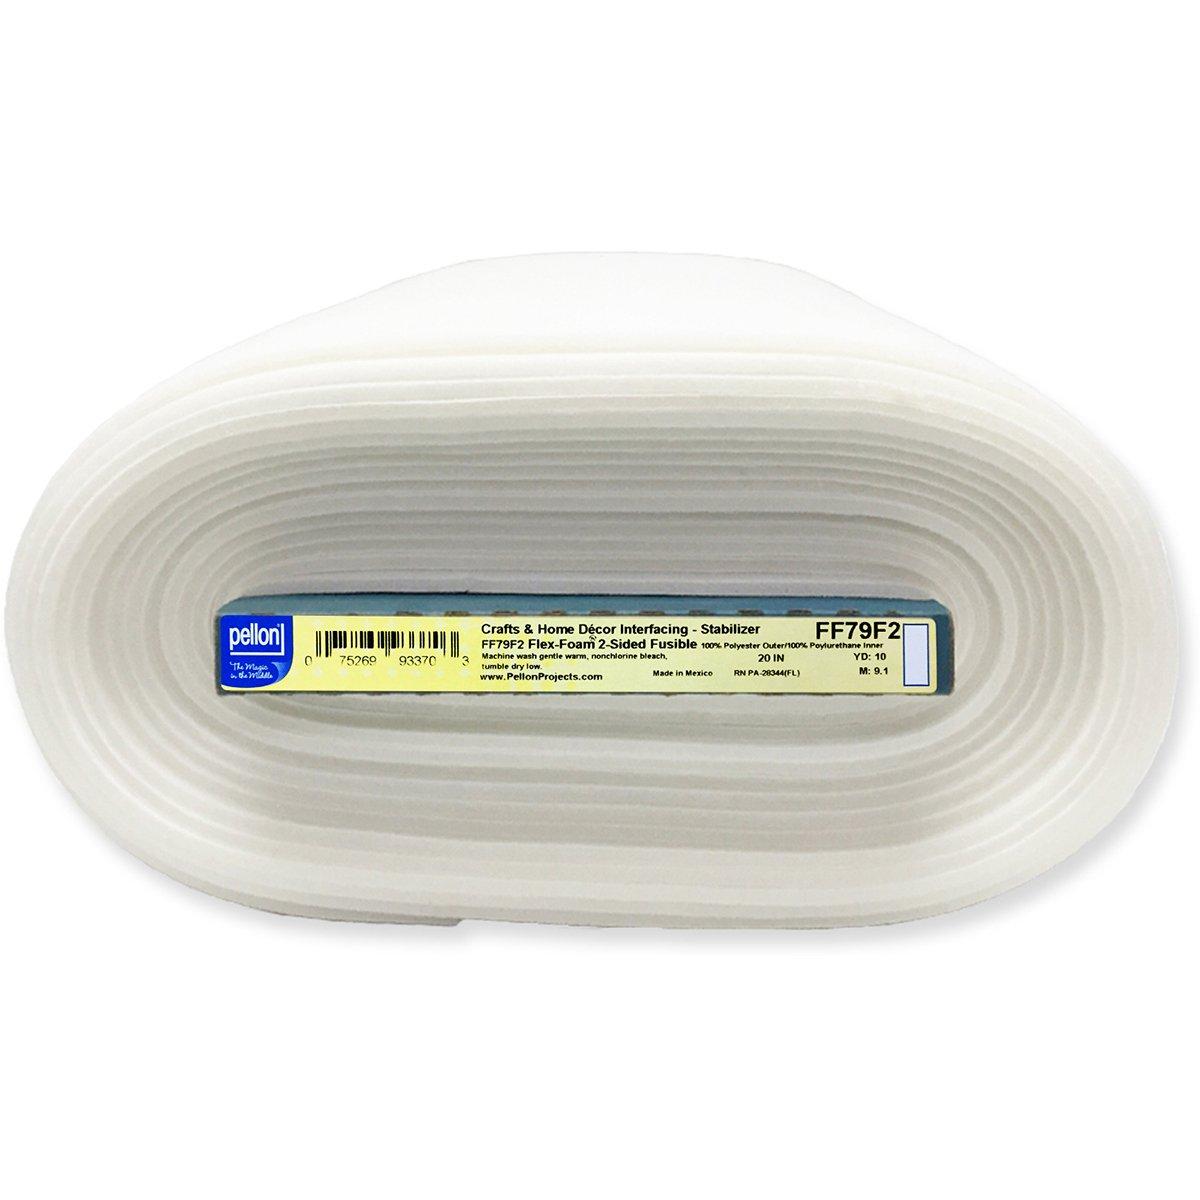 "Pellon FF79F2 Flex-Foam 2-Sided Fusible Foam Stabilizer - 20"" x 10 yd Board"